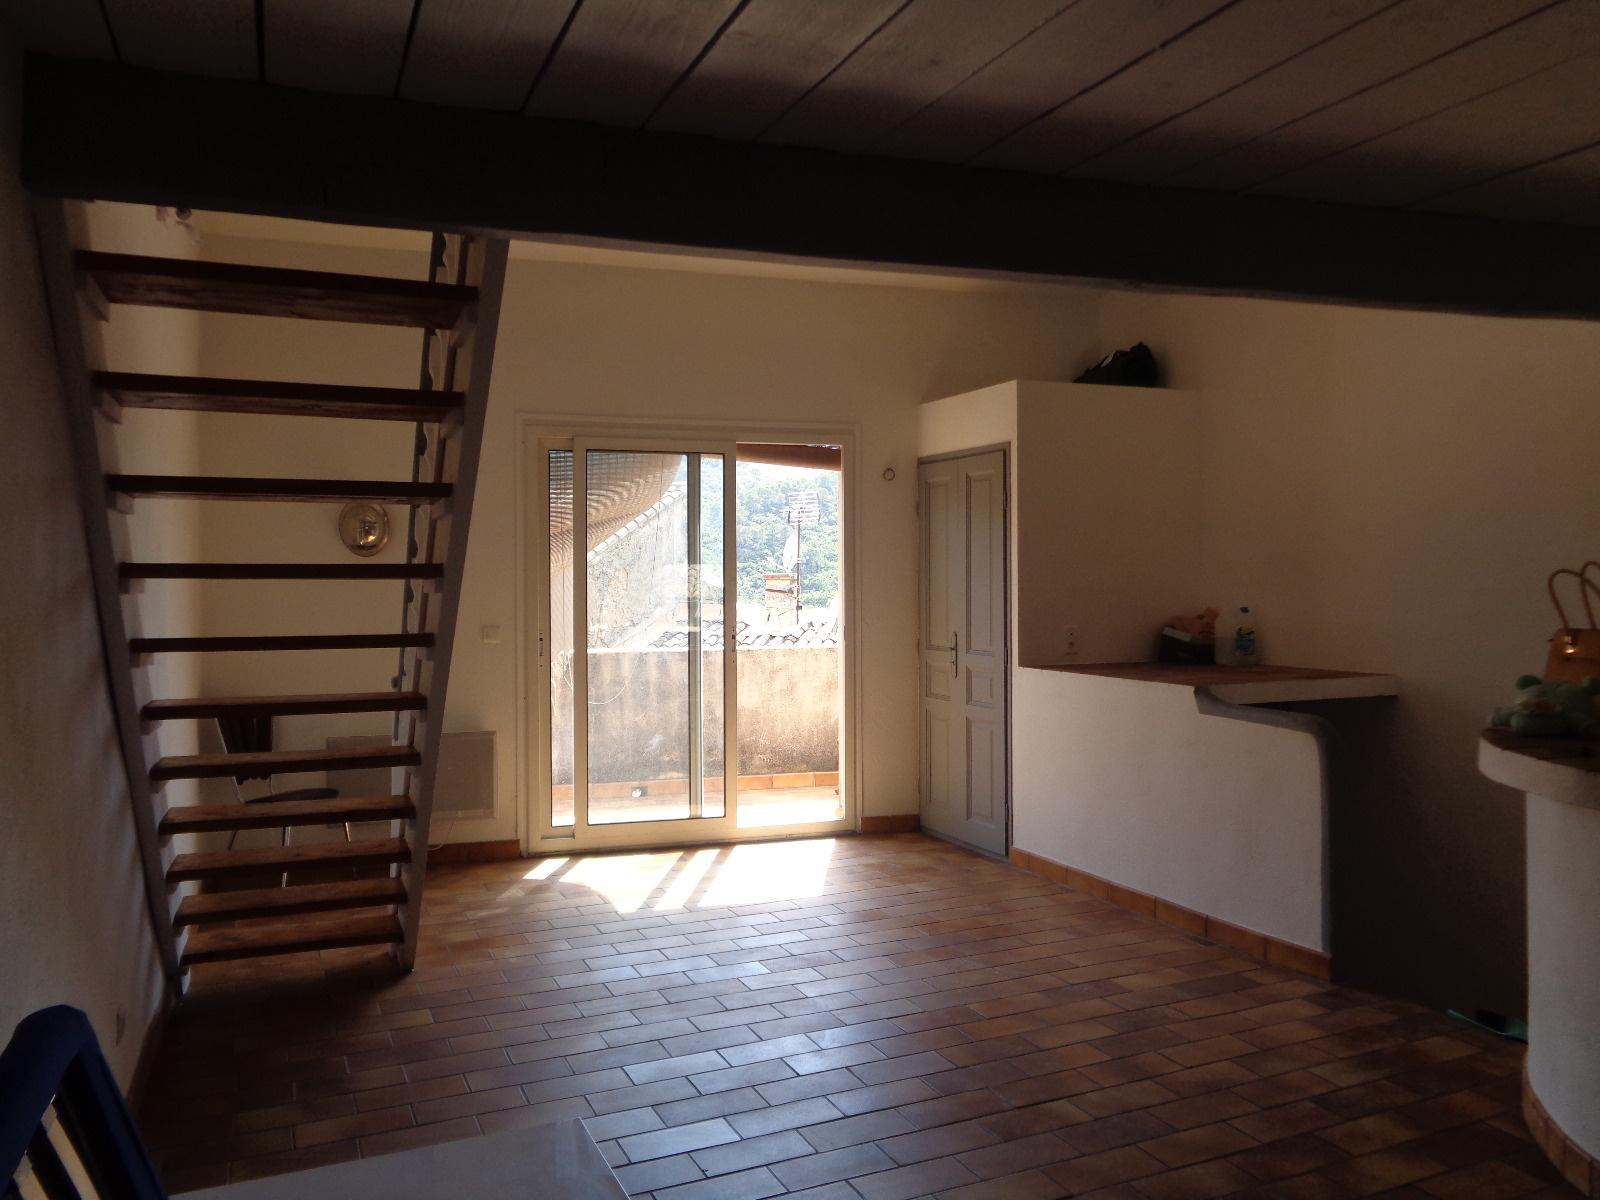 Location aix en provence location appartement aix en provence maisons louer - Appartement meuble aix en provence ...